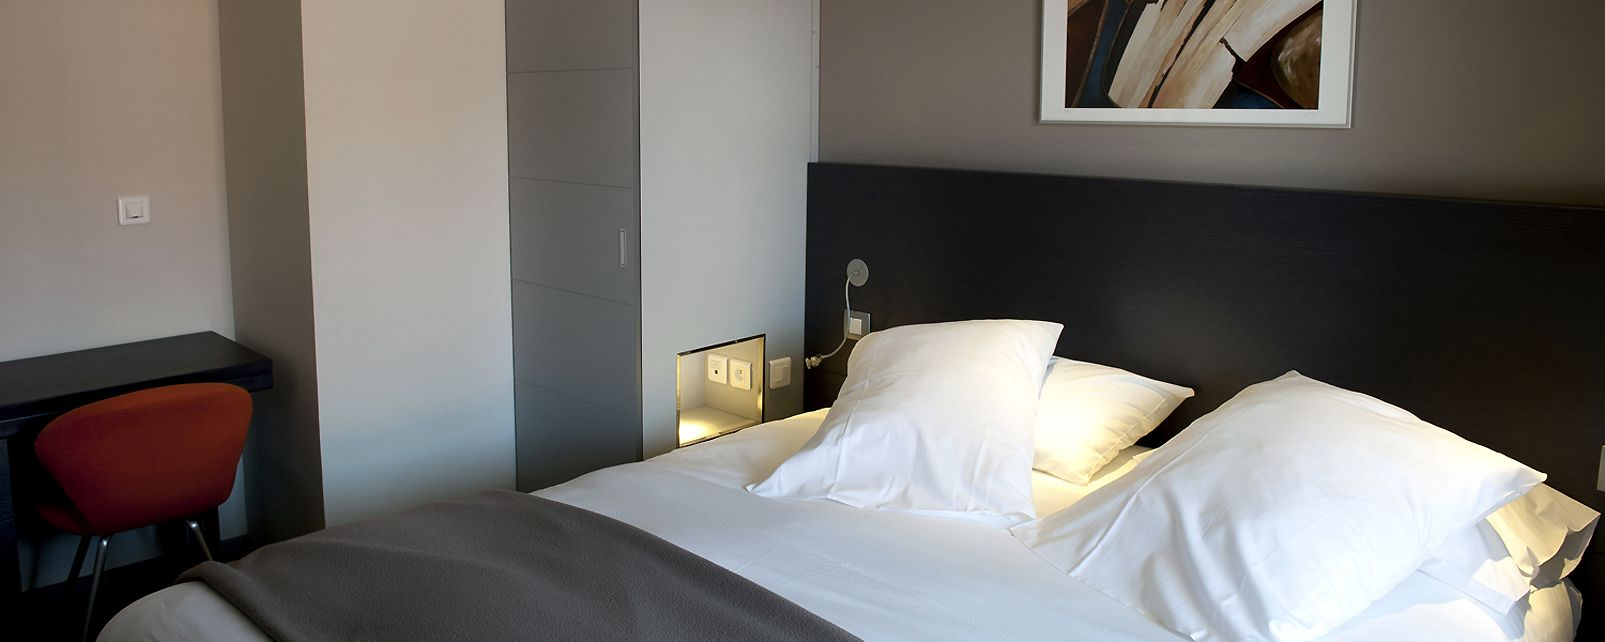 Hotel Clément Adler